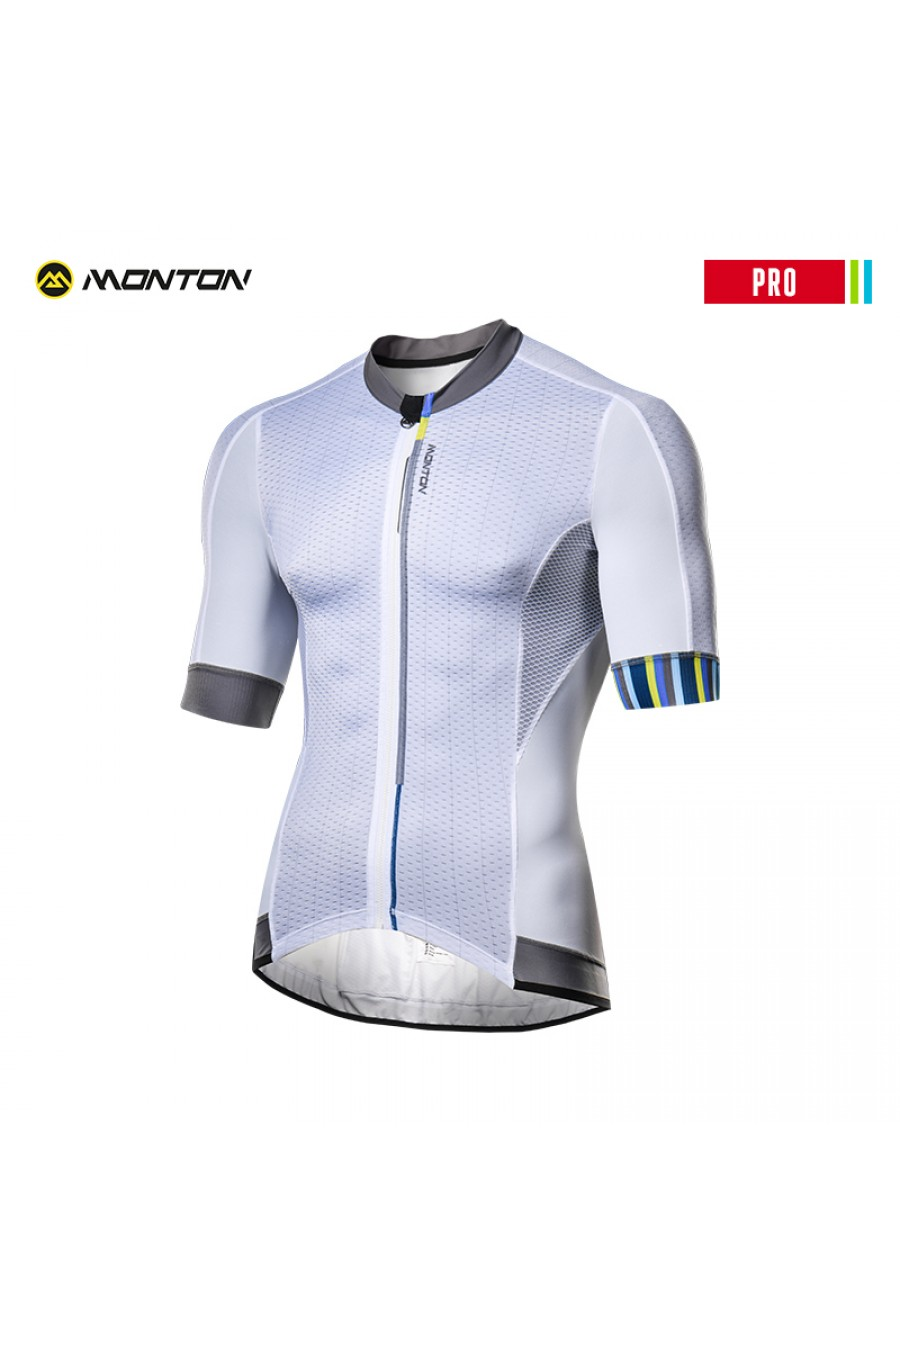 Buy 2018 Mens Plain White Short Sleeve Cycling Jersey PRO Fit 41bfe37e5